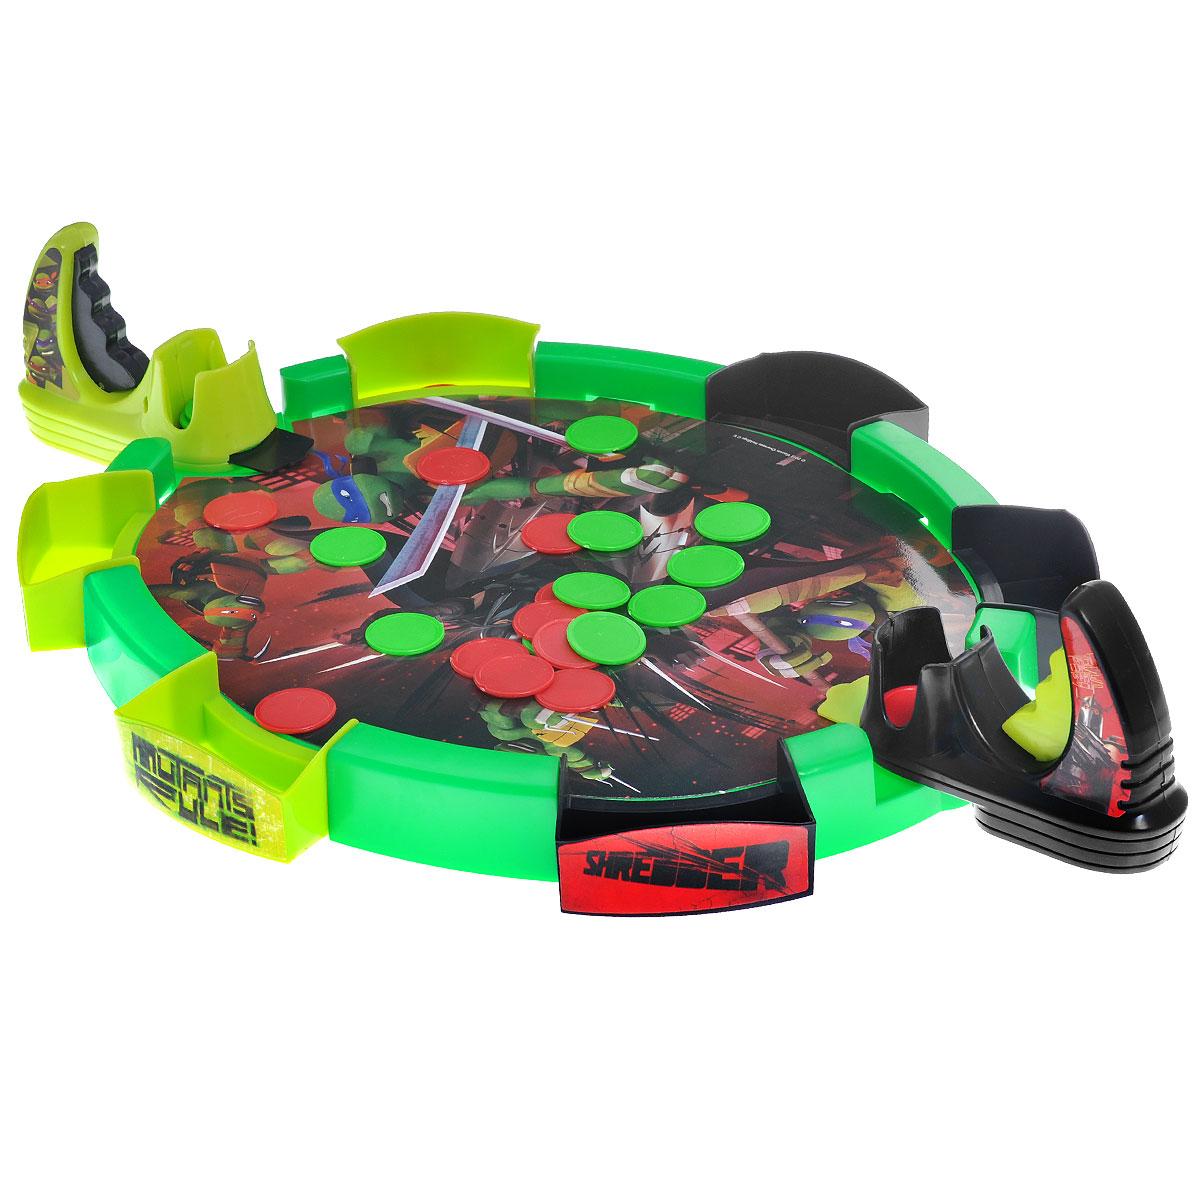 Настольная игра Turtles